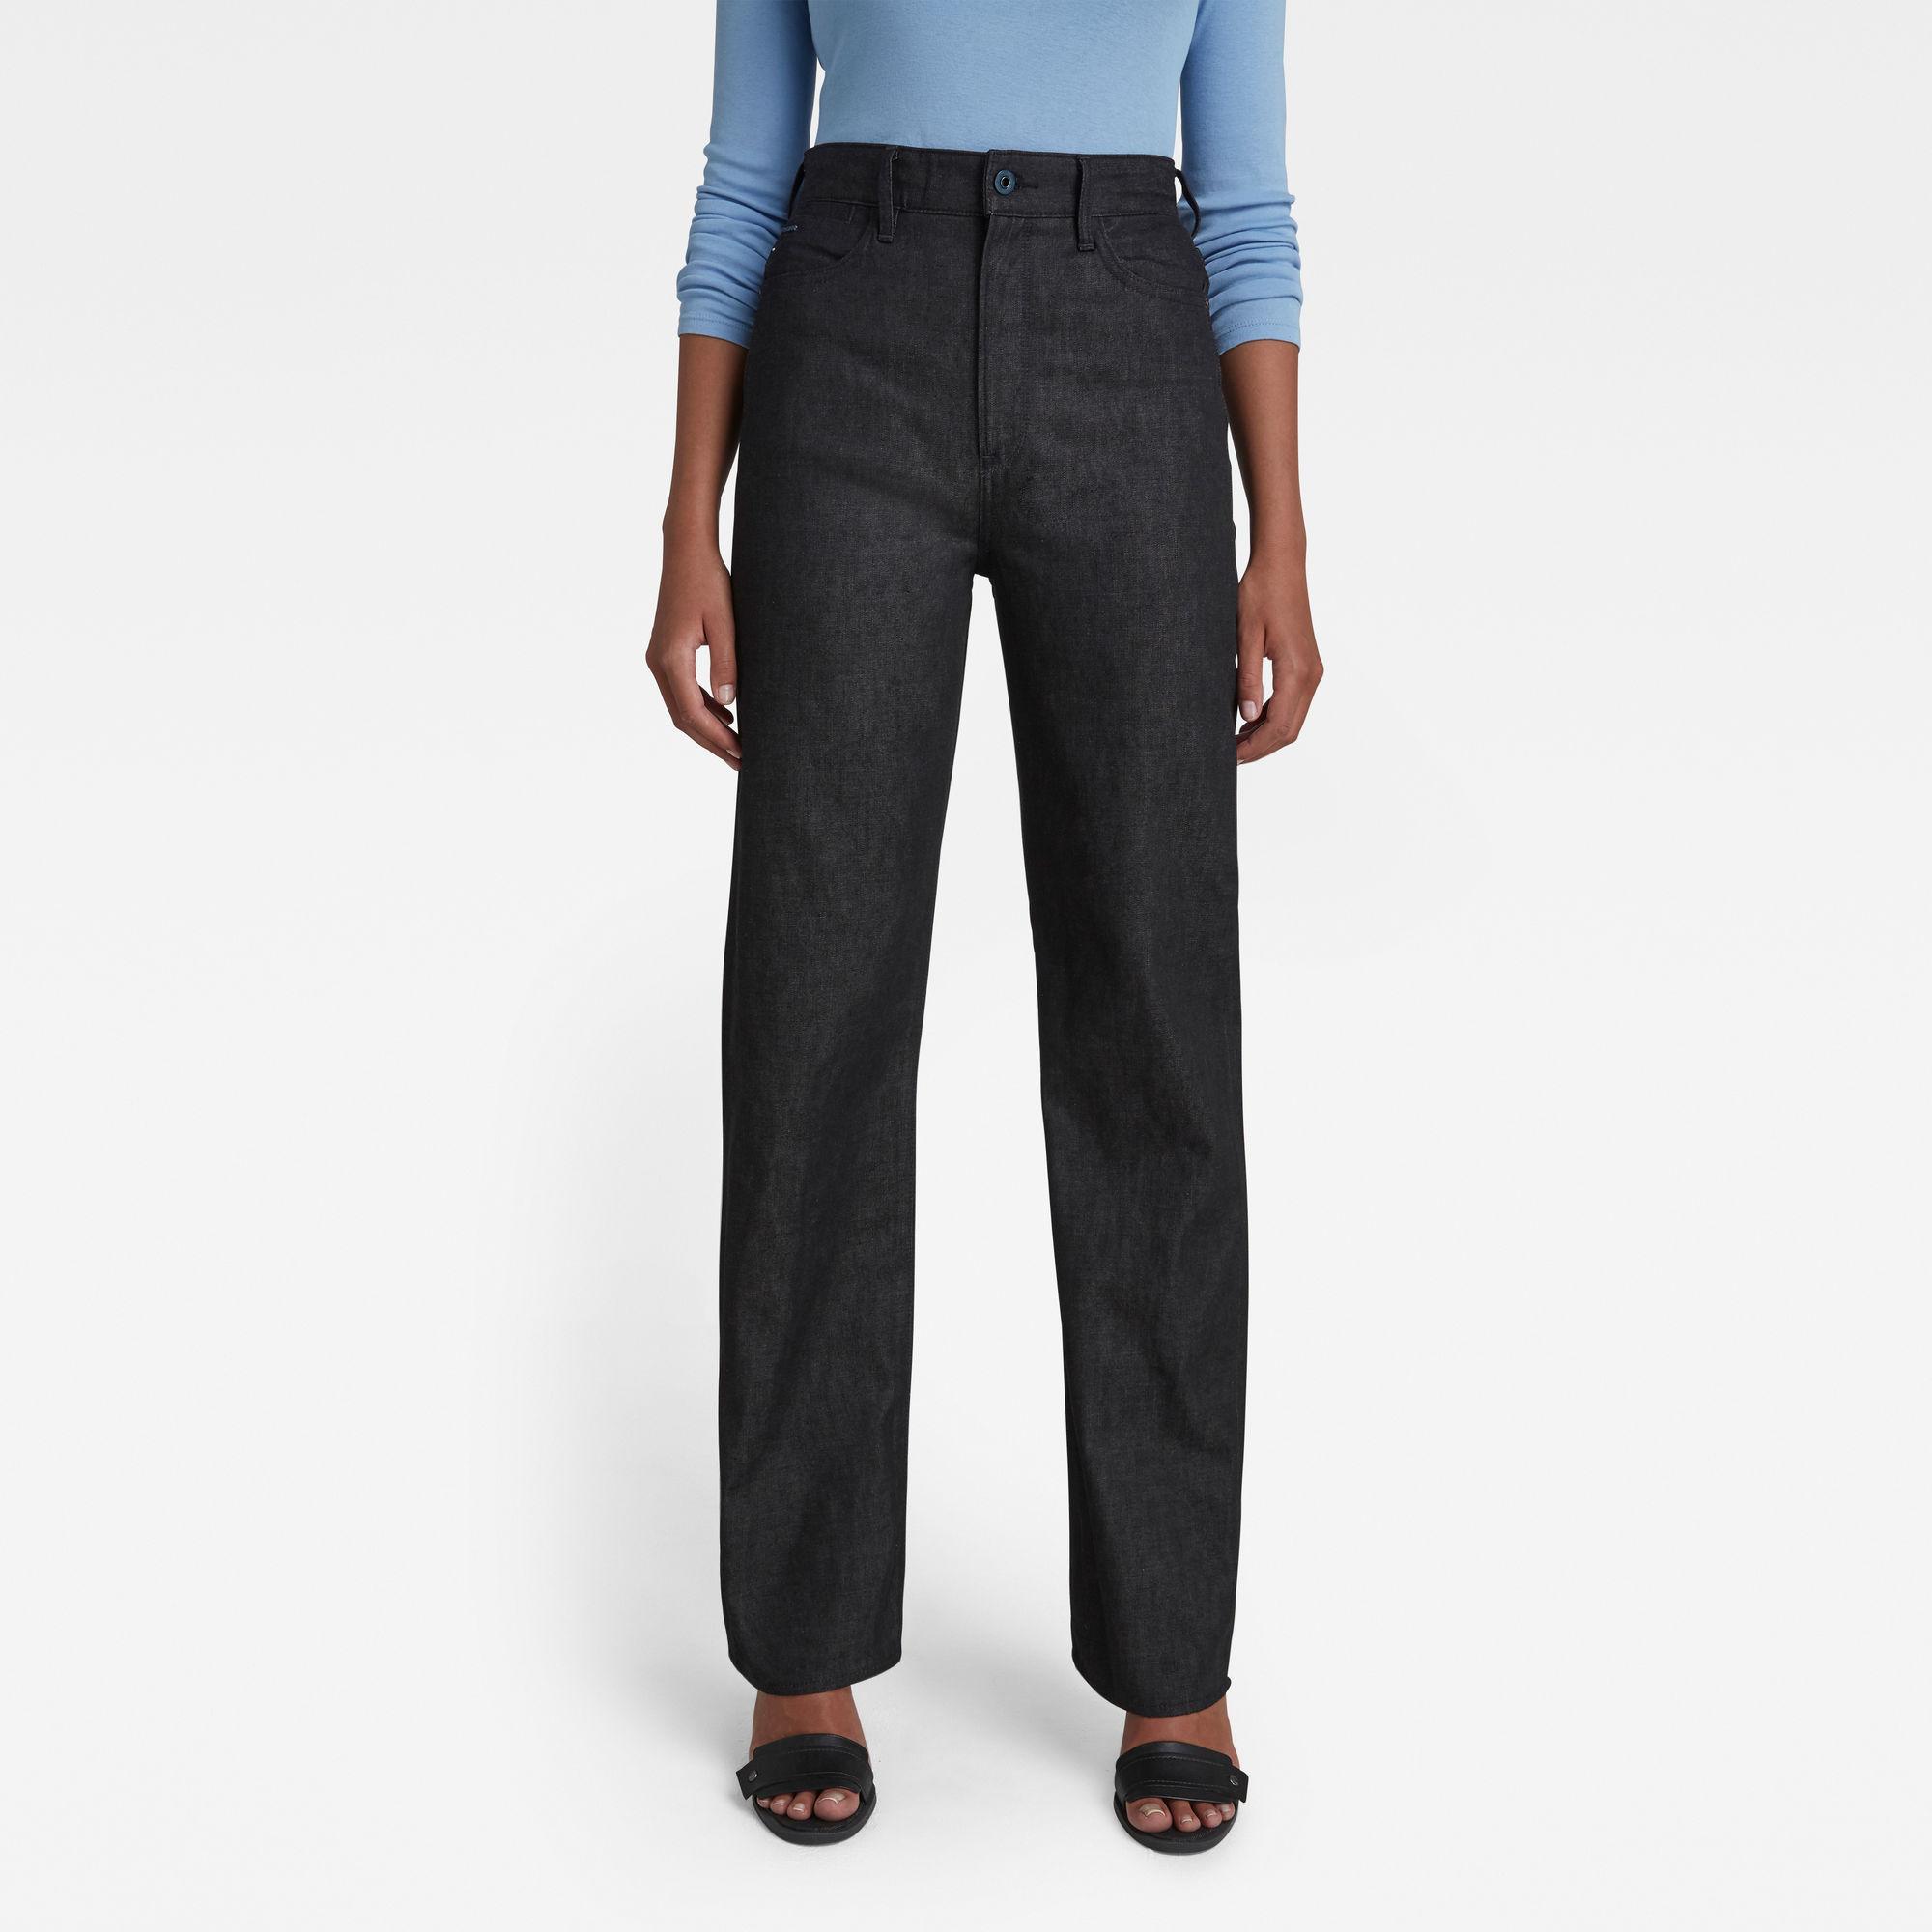 G-Star RAW Dames Tedie Ultra High Straight Jeans Zwart